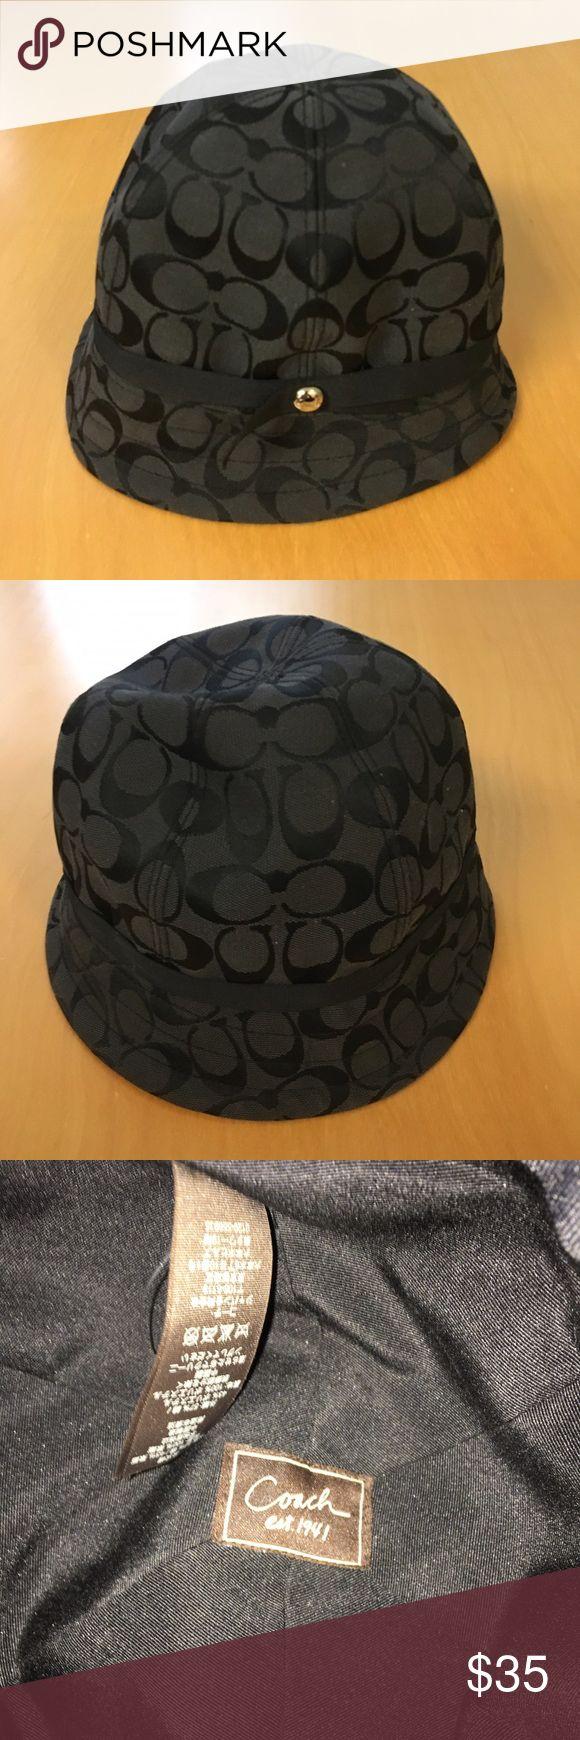 Coach black signature hat Authentic signature Coach hat in size small. Excellent condition! Coach Accessories Hats